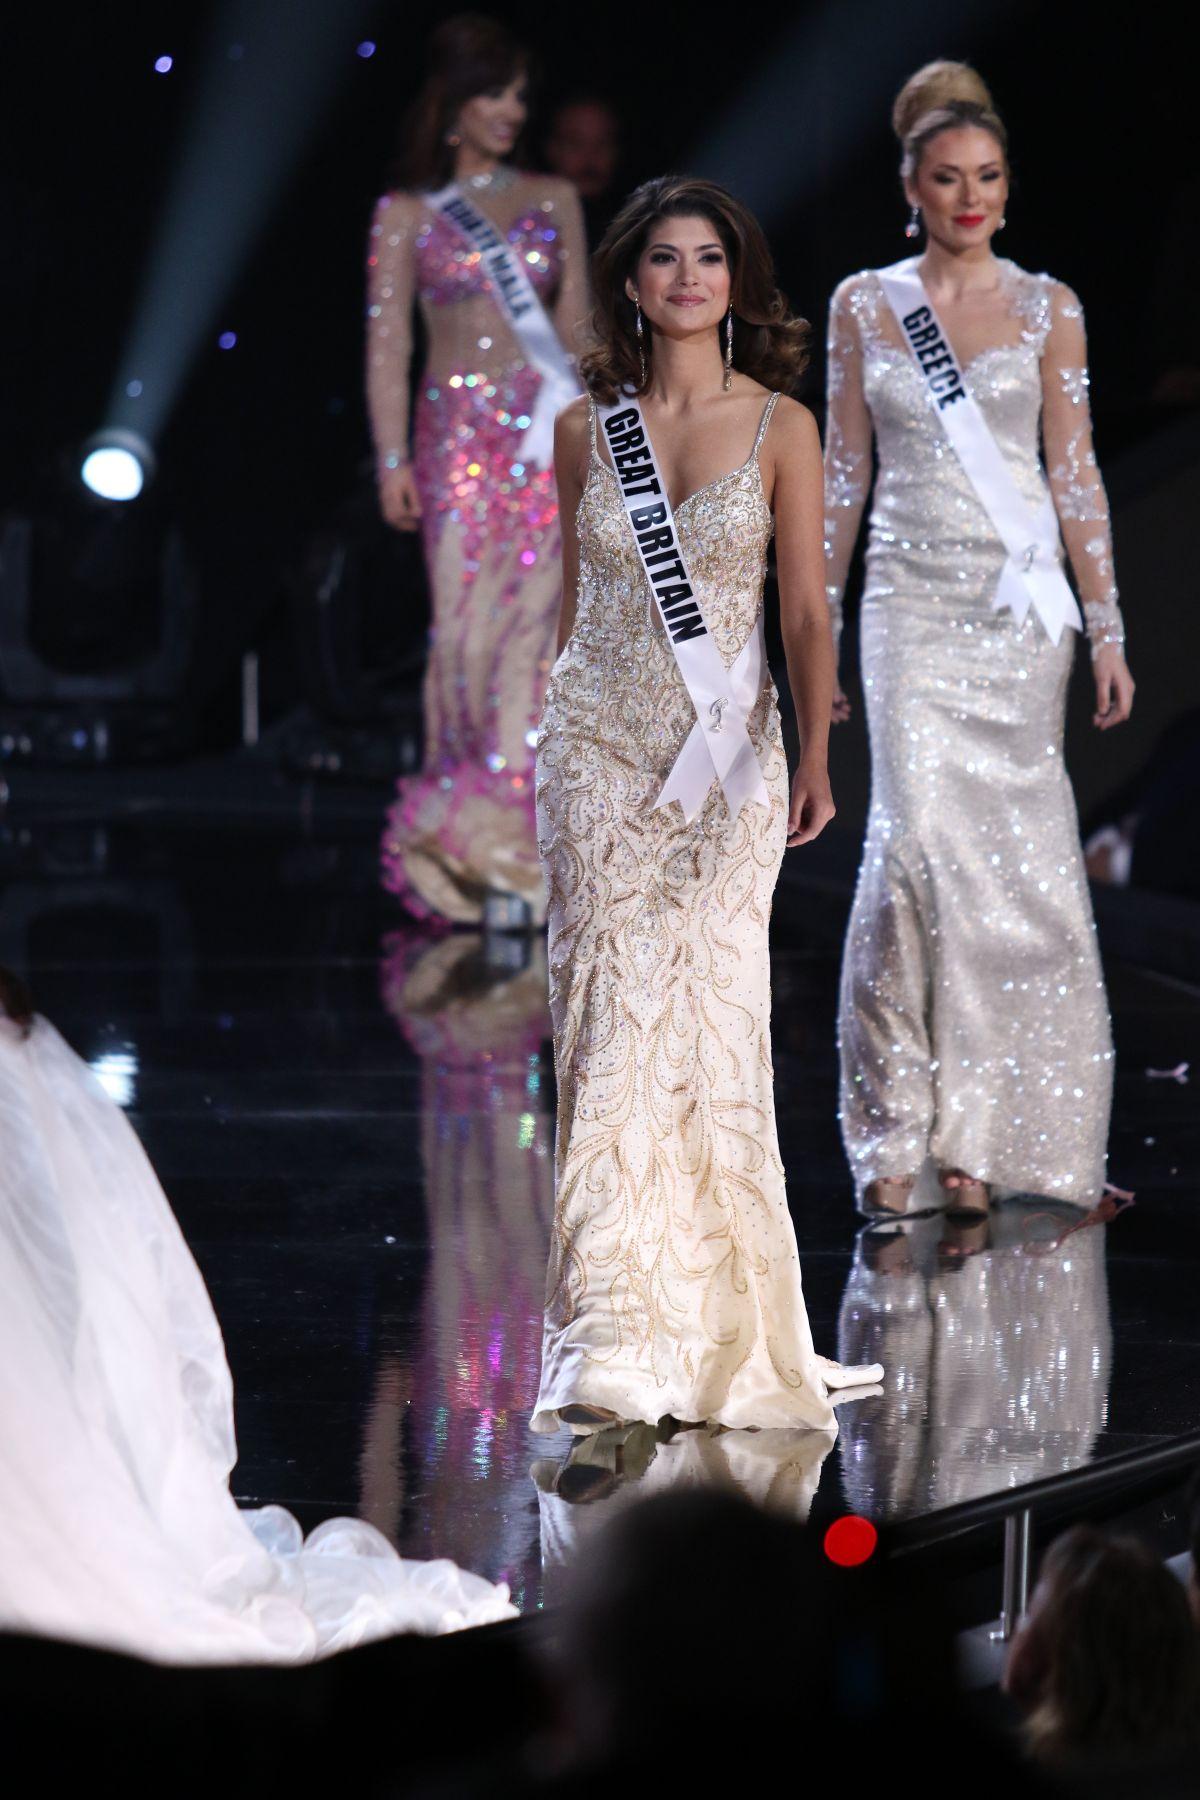 NARISSARA NENA FRANCE - Miss Universe 2015 Preliminary Round 12/16/2015